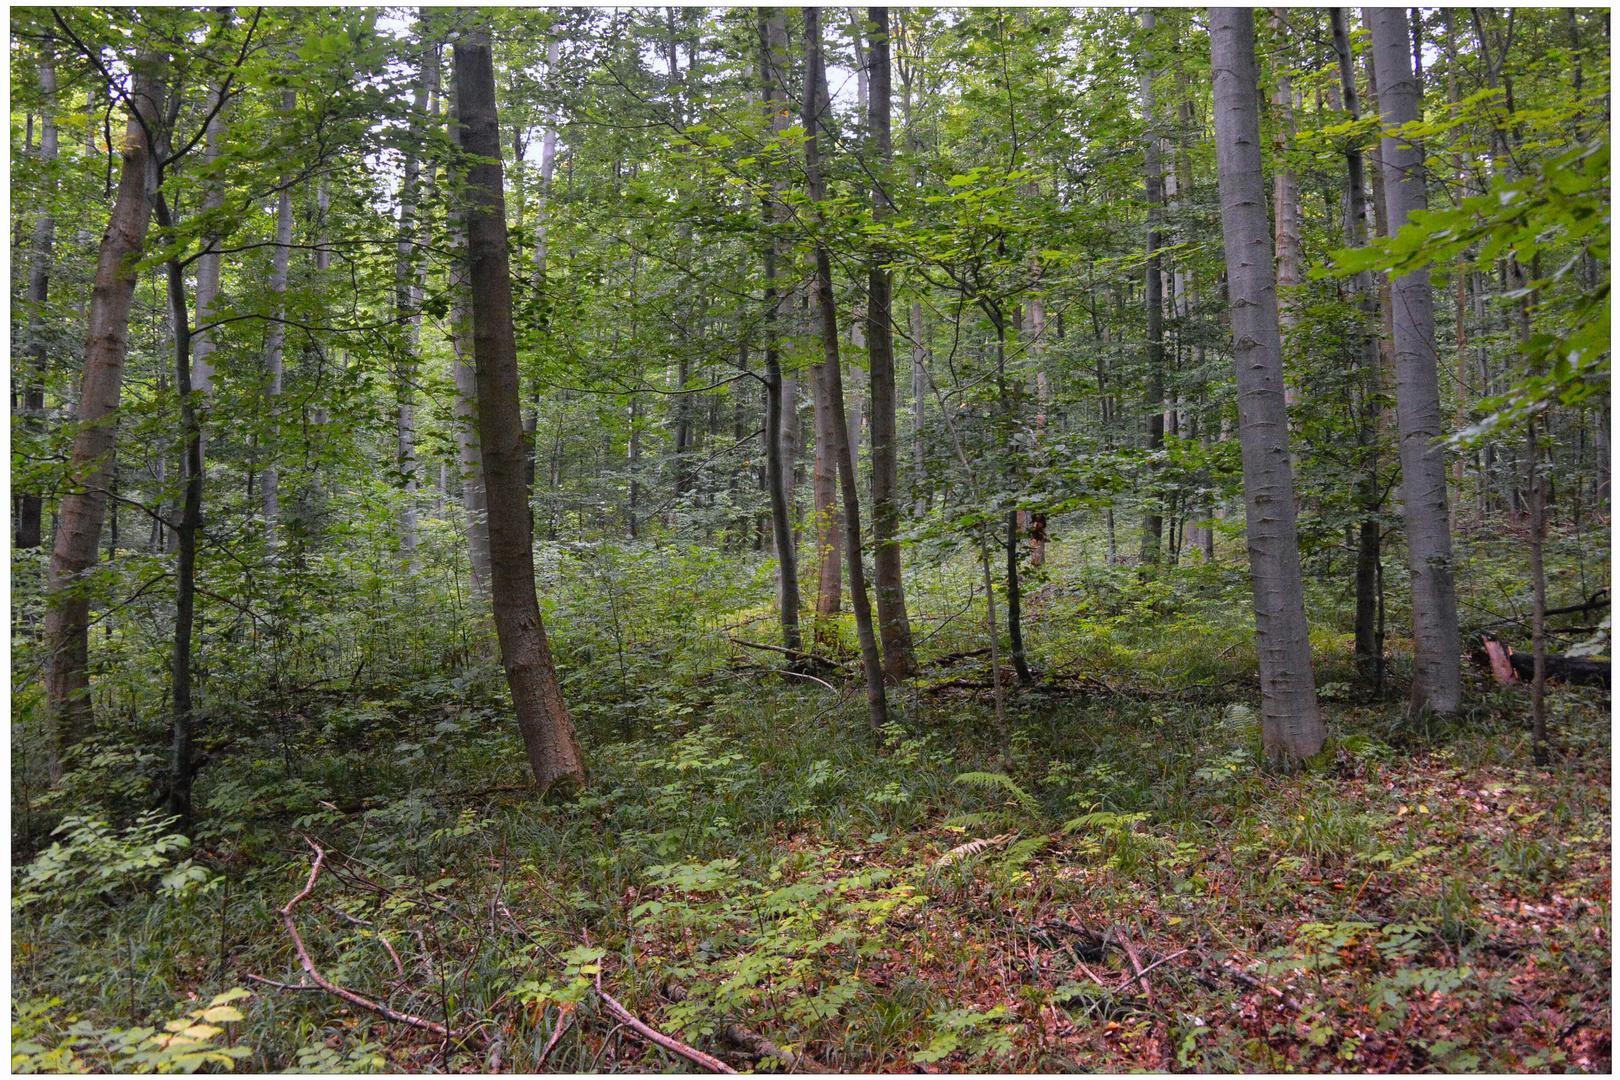 Hoy en el bosque II (Heute im Wald II)